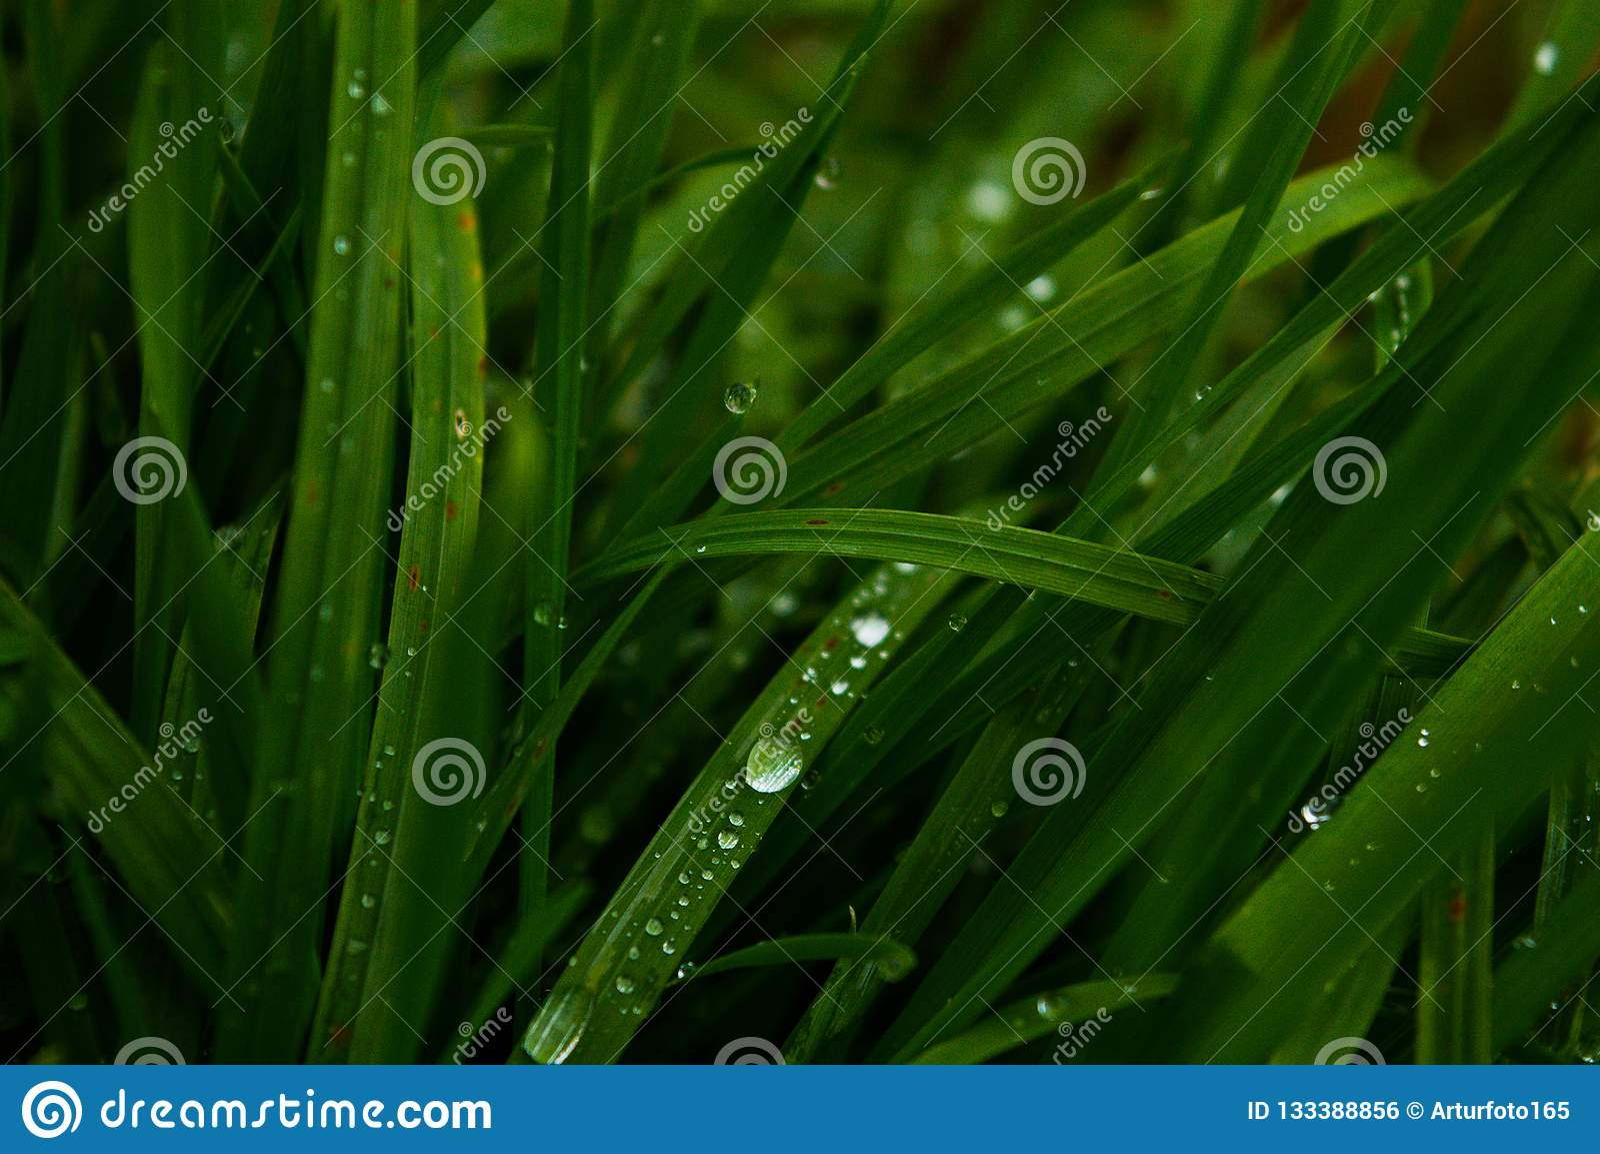 Lang grünes Gras, Regentropfen